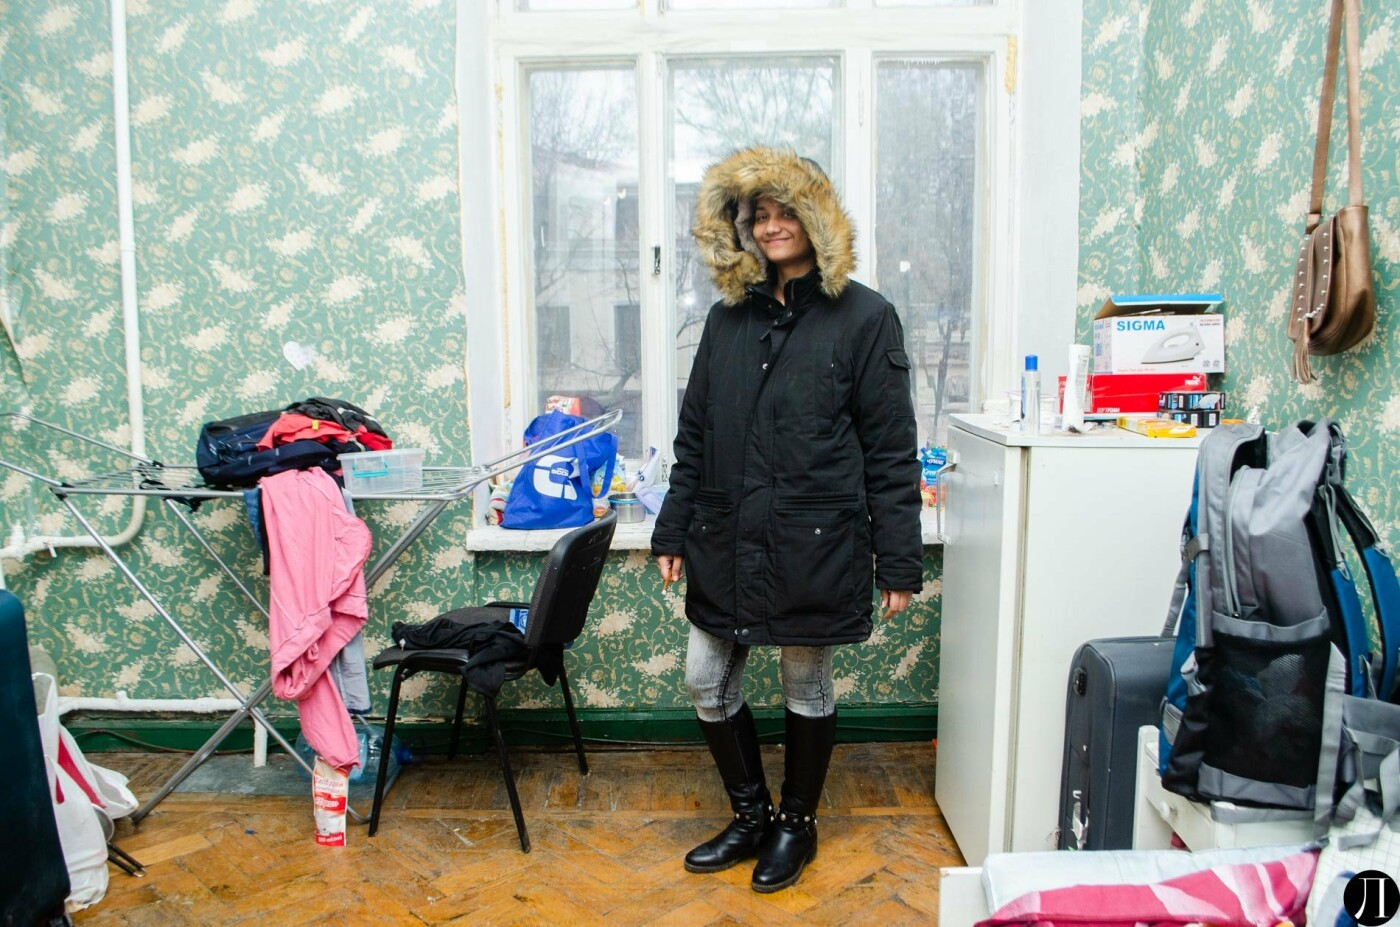 Памятник архитектуры в центре Одессы превратили в общежитие, - ФОТО, фото-2, Фото: Лоция